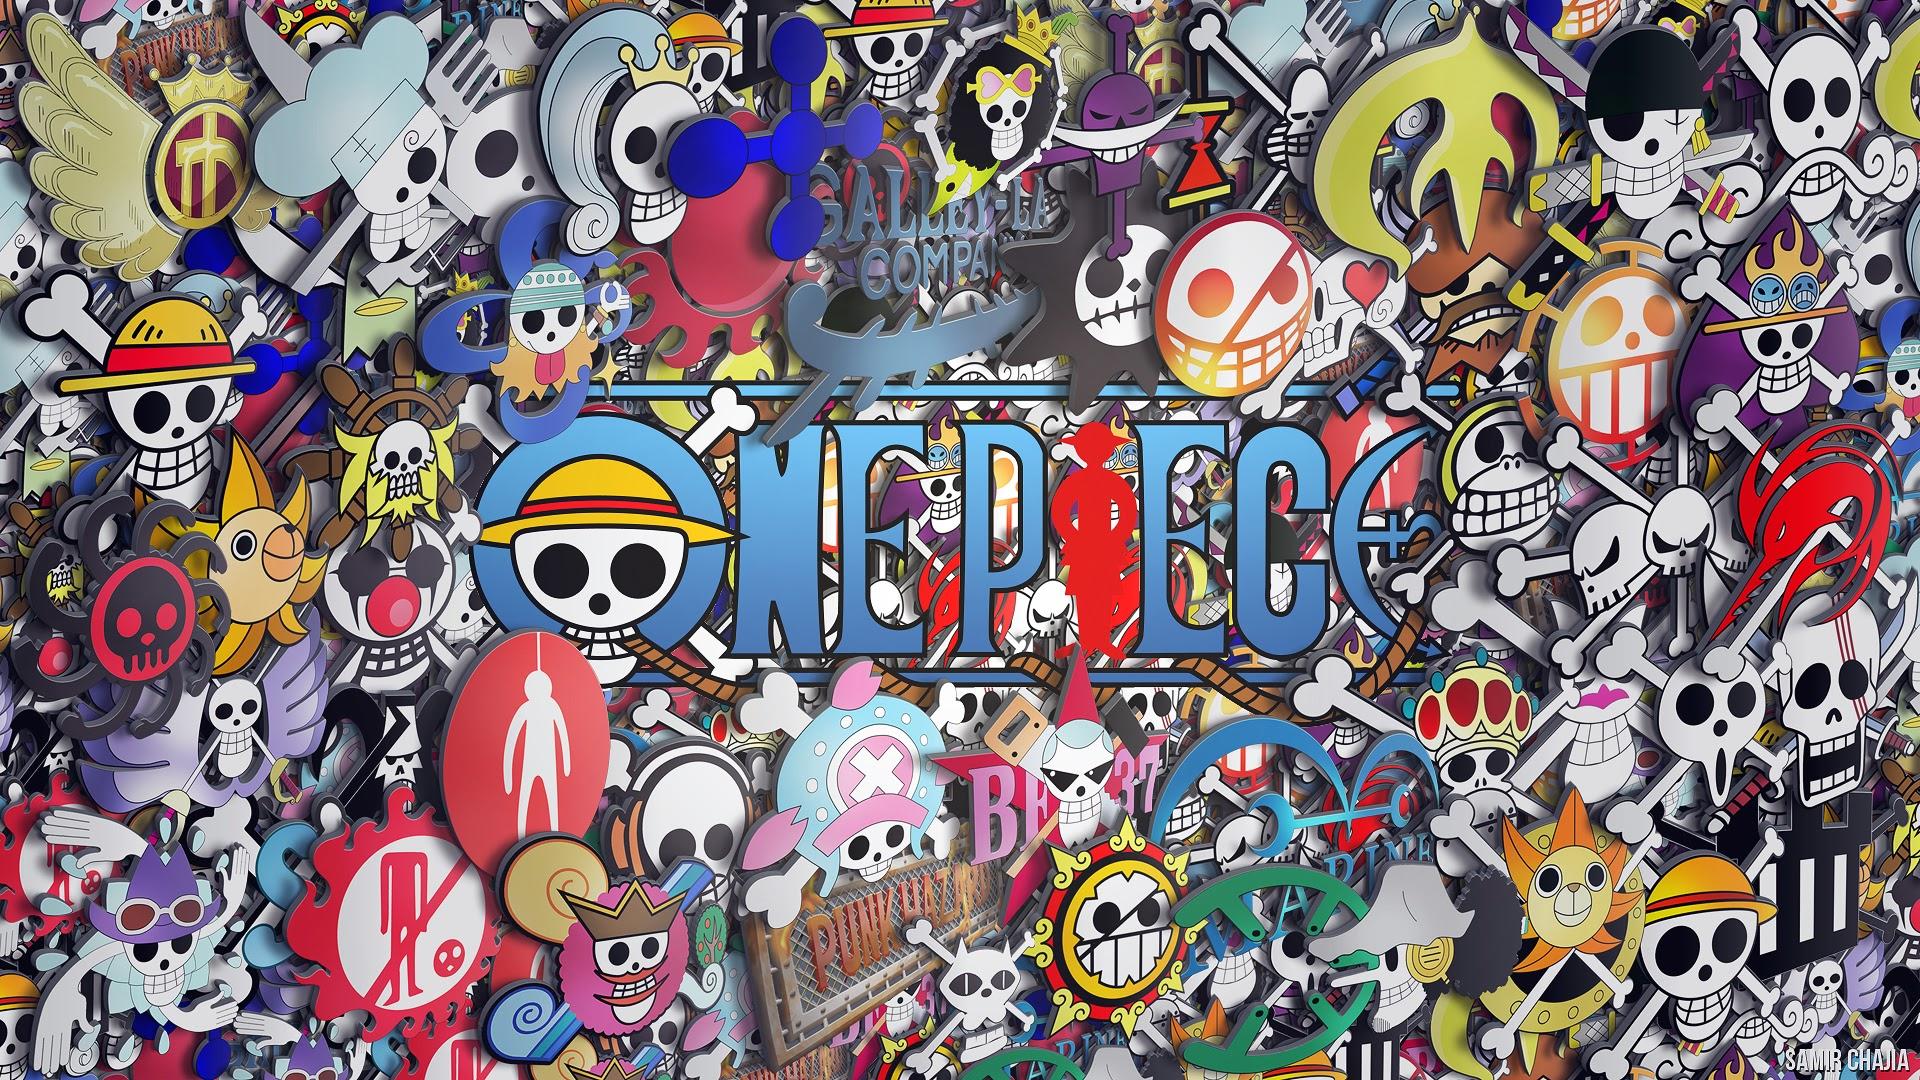 one piece pirates logo hd wallpaper one piece anime 1920x1080 a415 1920x1080